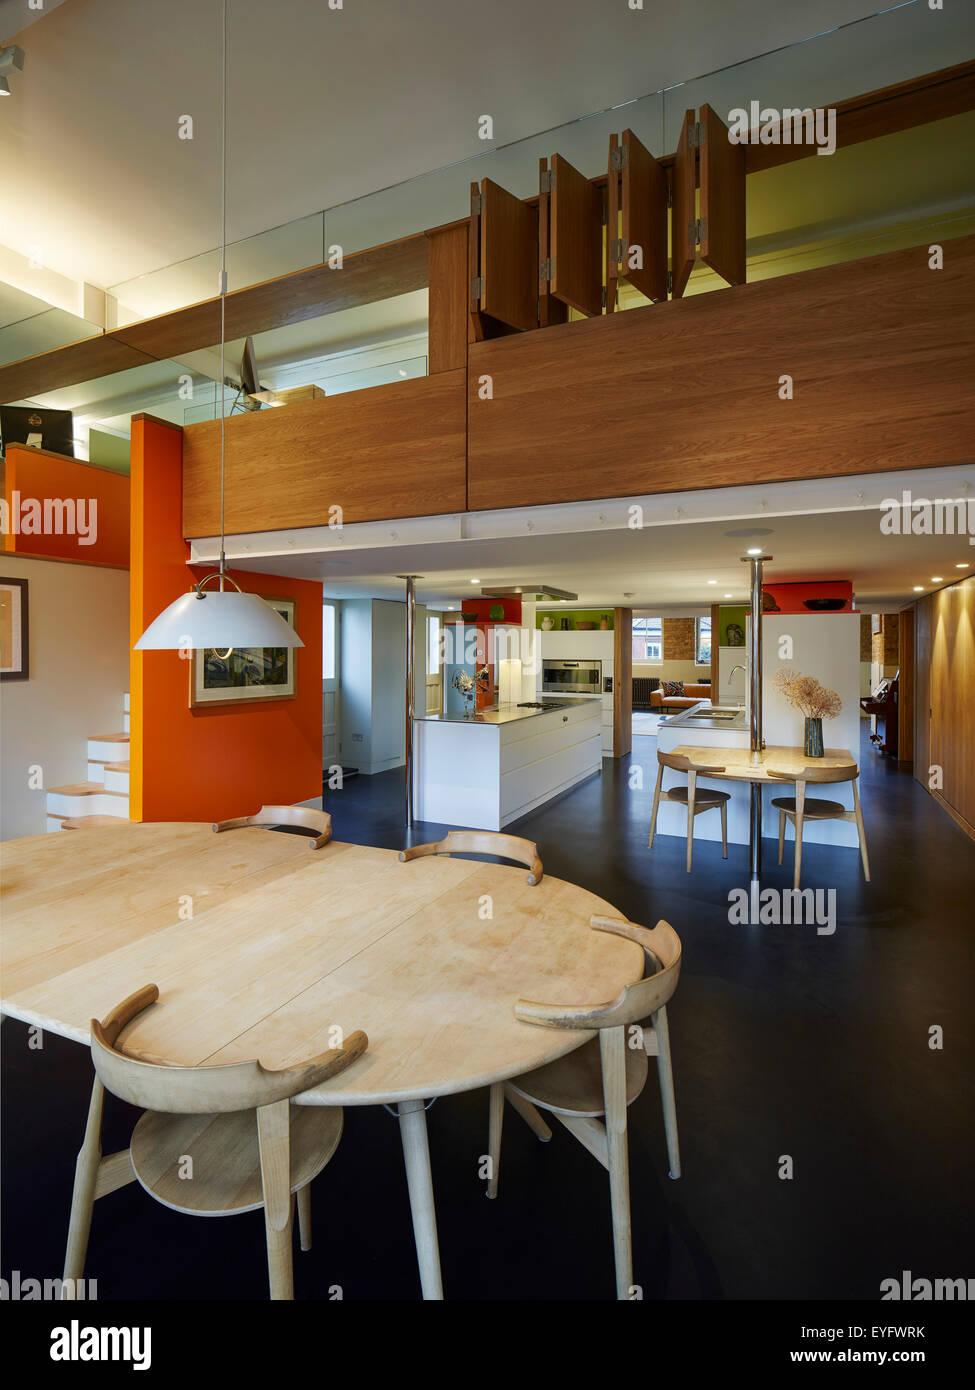 Mezzanine Area dining area with view through towards mezzanine, kitchen and